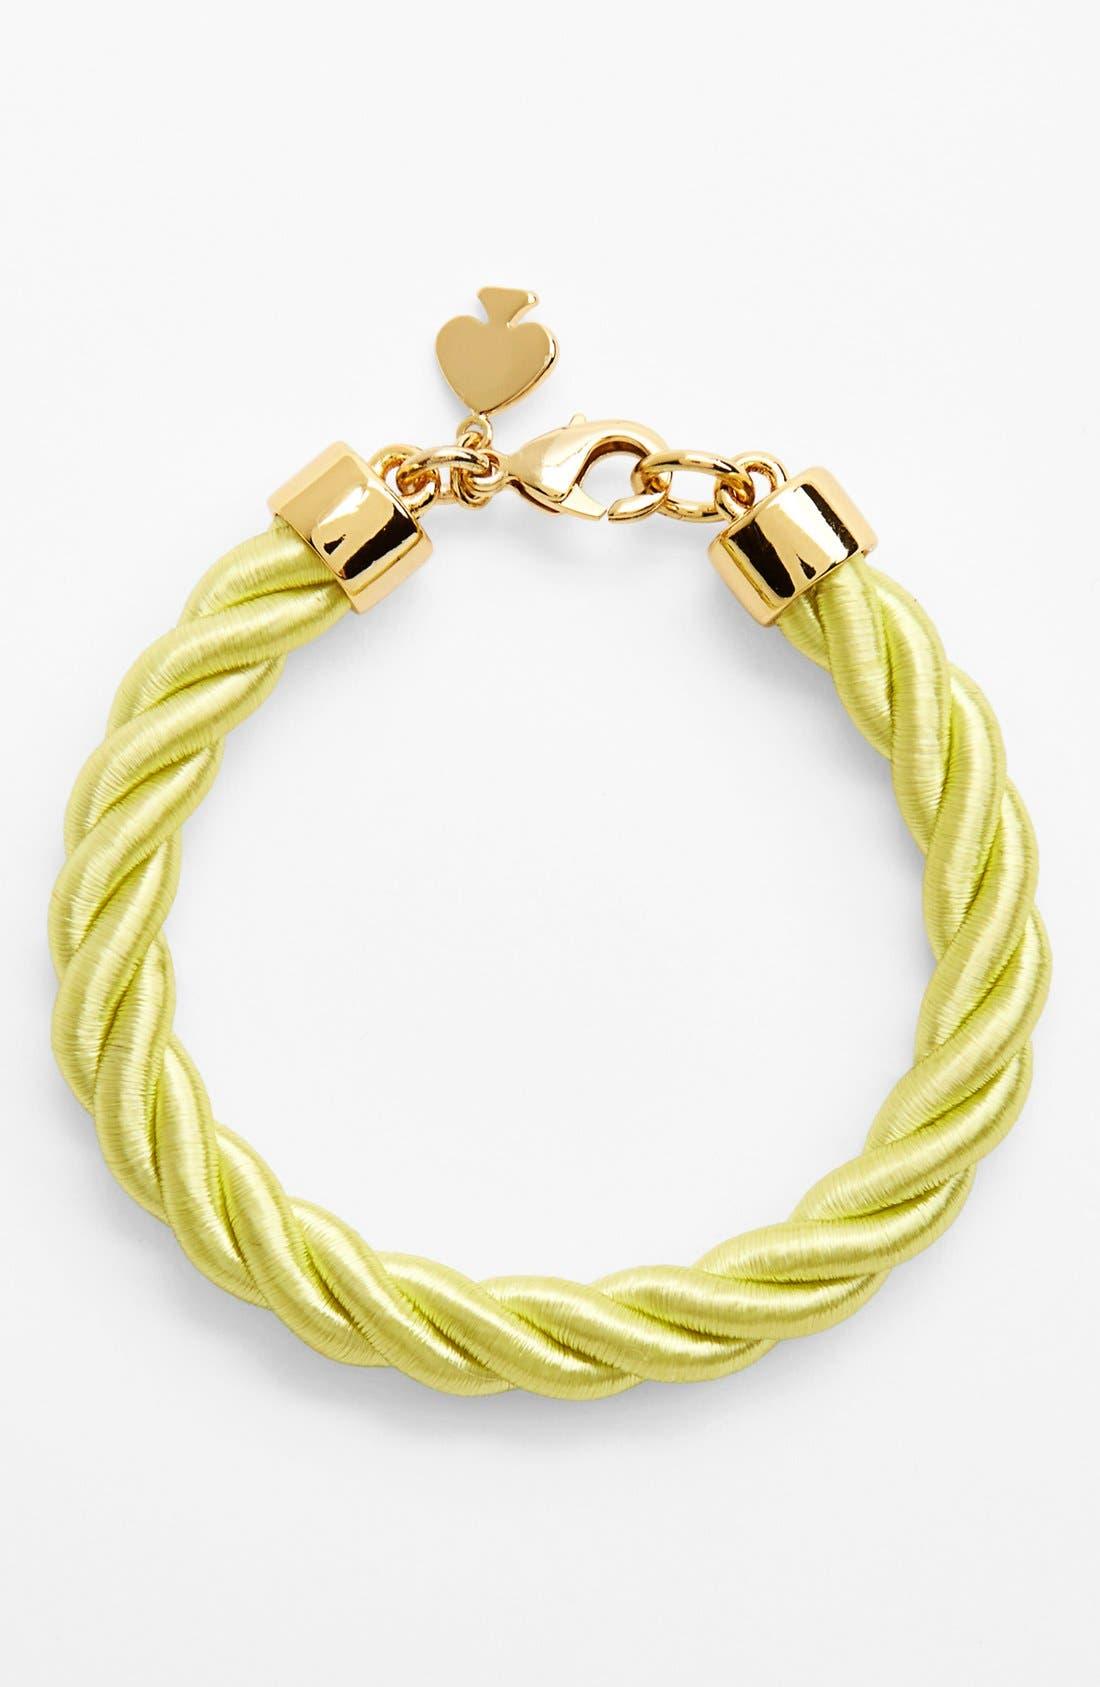 Alternate Image 1 Selected - kate spade new york 'learn the ropes' cord bracelet